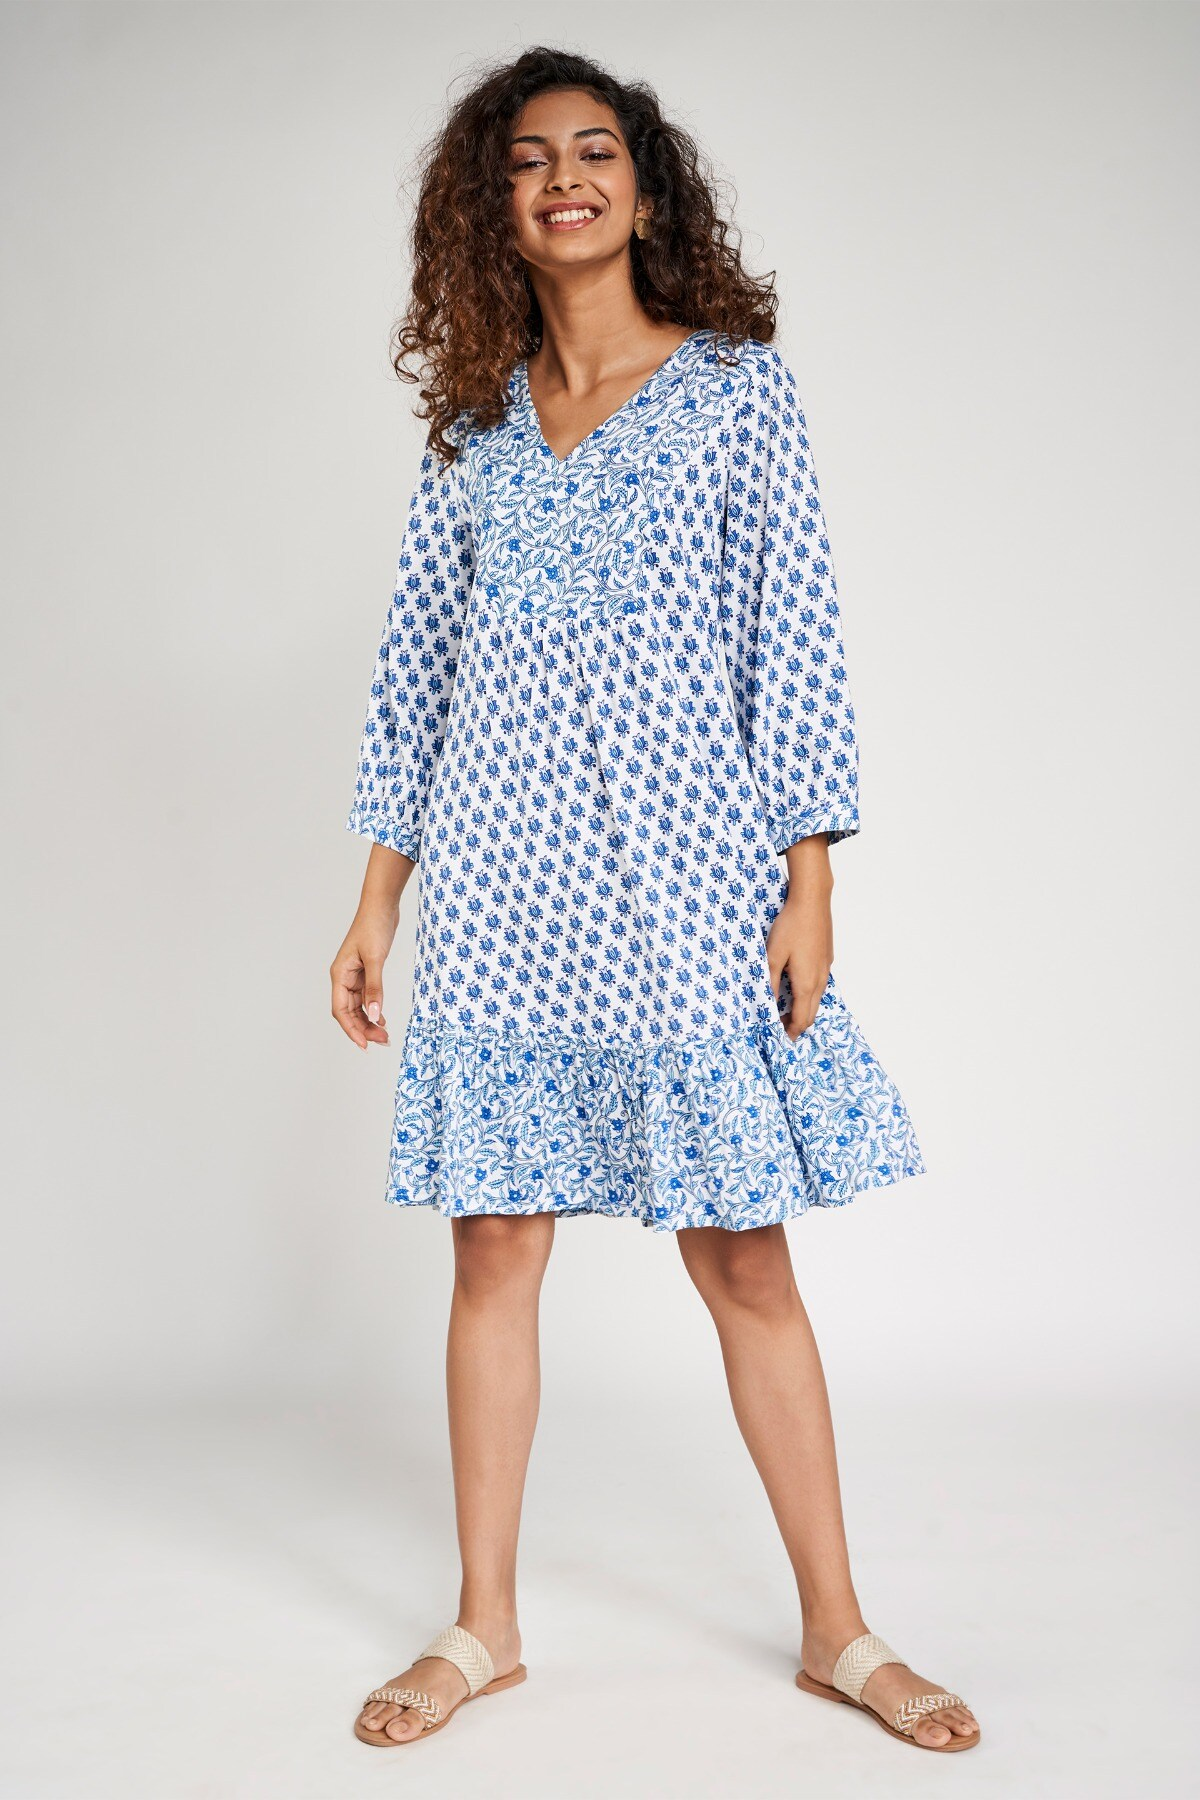 Global Desi | Blue Floral Printed Trapese Dress